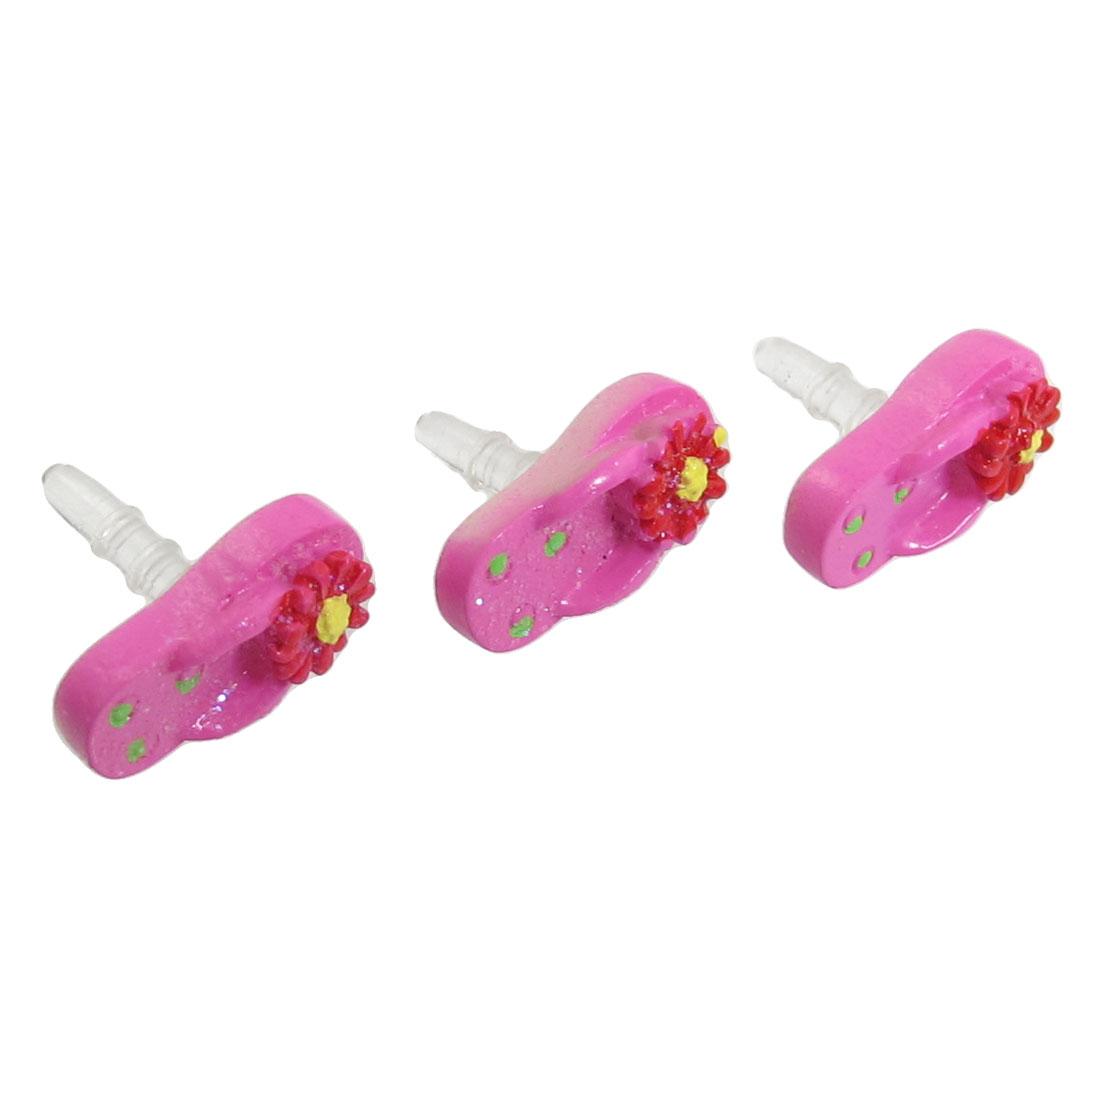 3 Pcs Fuchsia Slipper Decor 3.5mm Earphone Ear Cap Dust